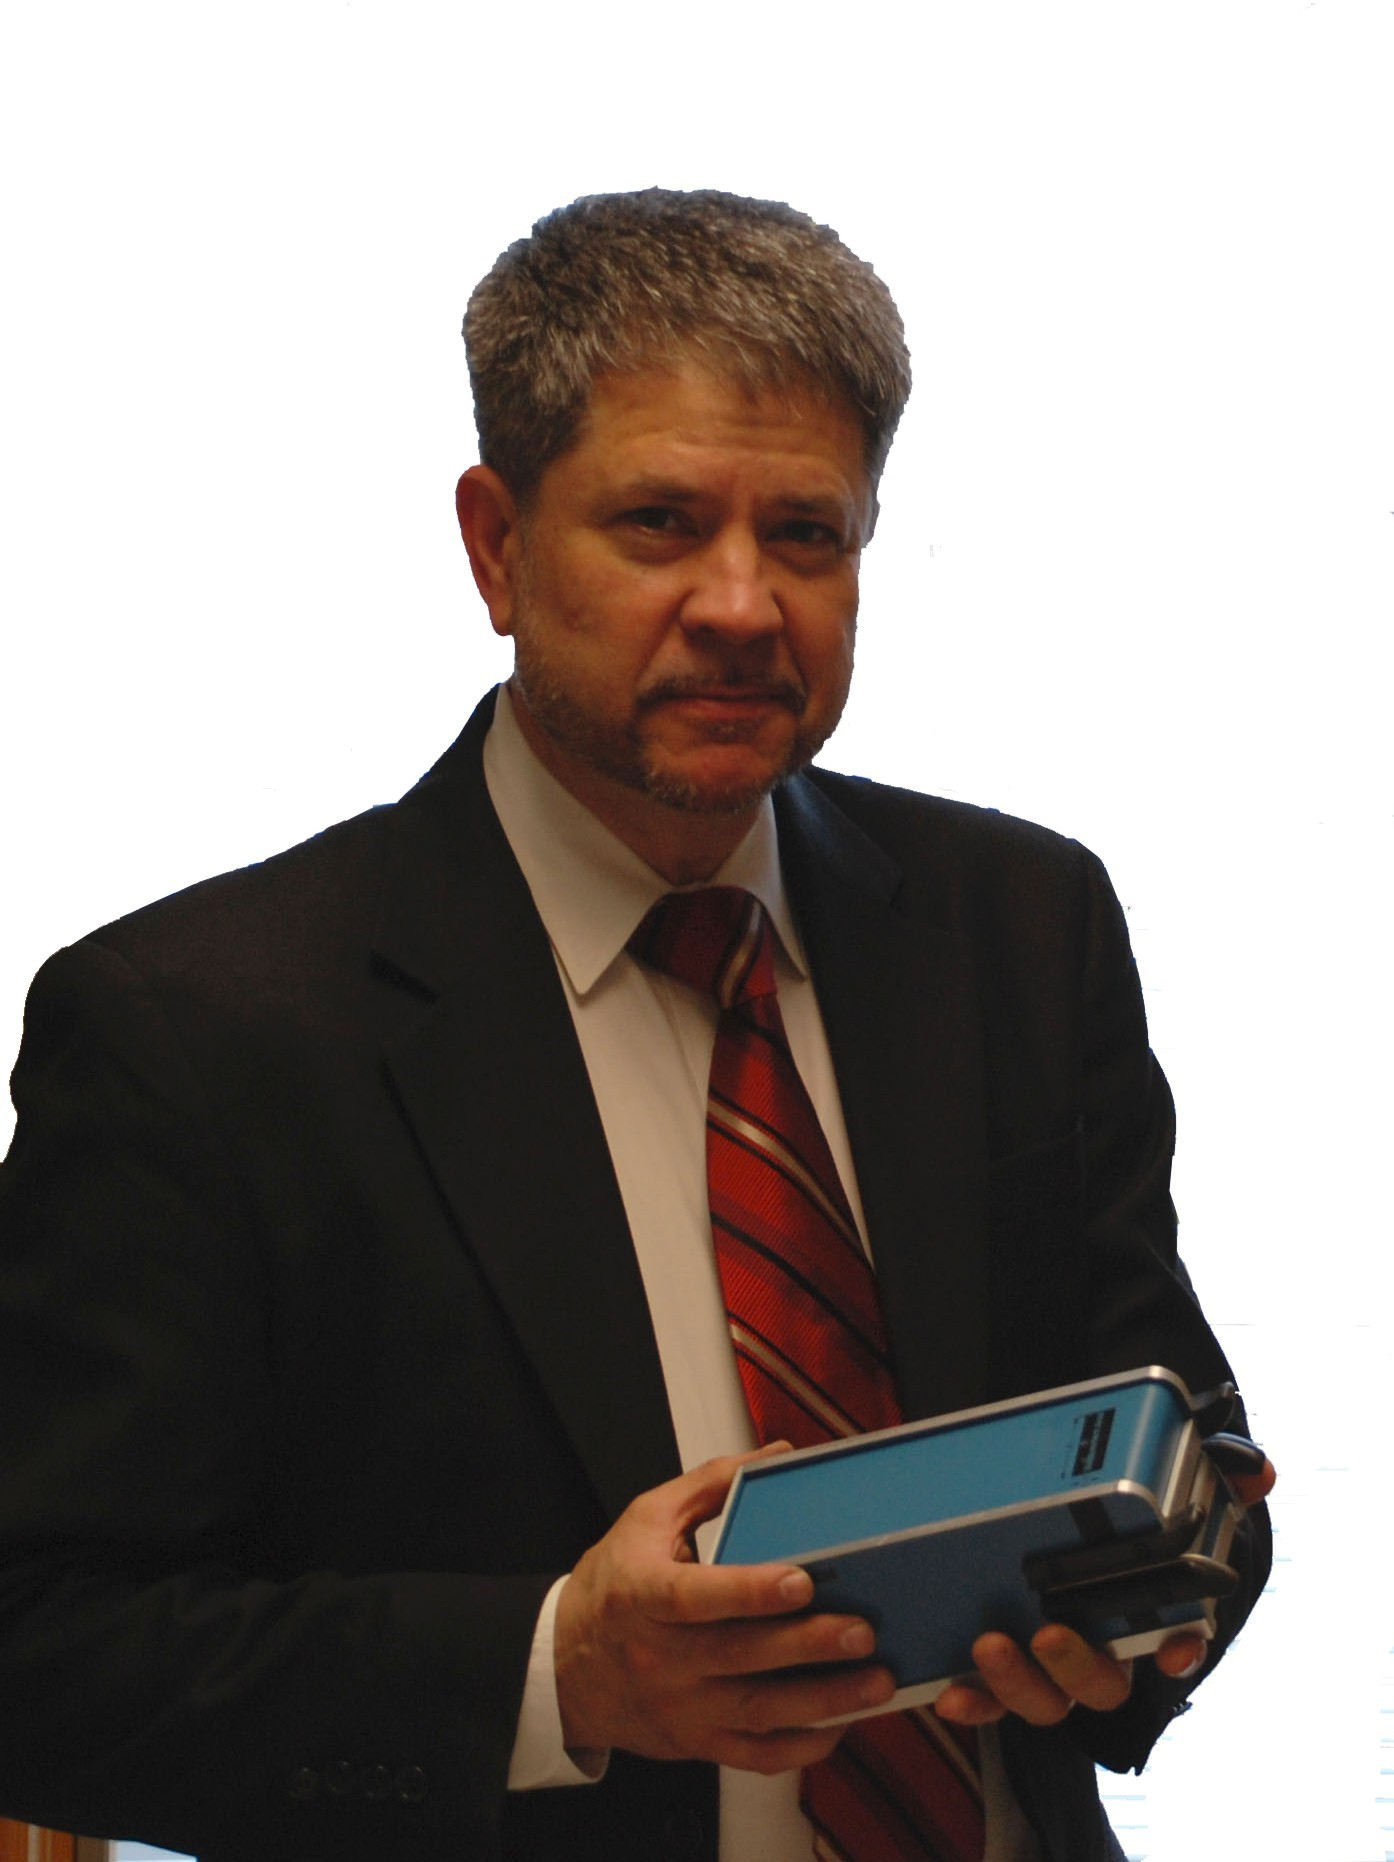 Doug Lawrence, Founder